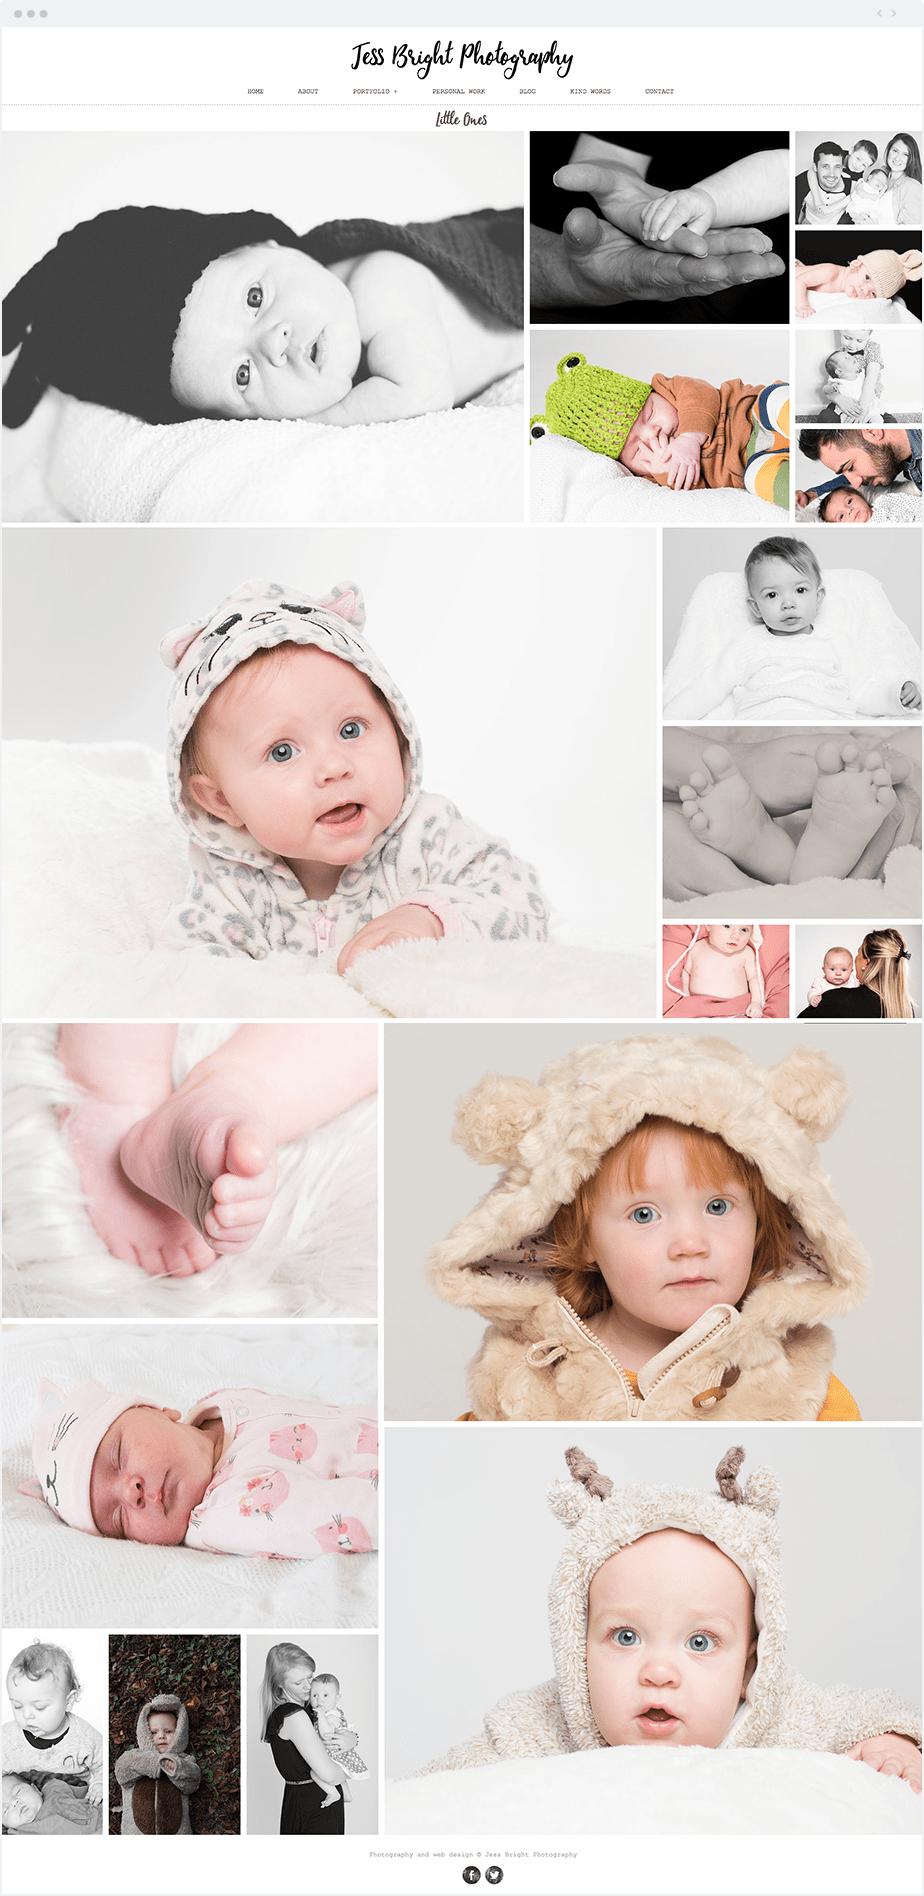 Beautiful Wix photography website by newborn and maternity photographer Jess Bright